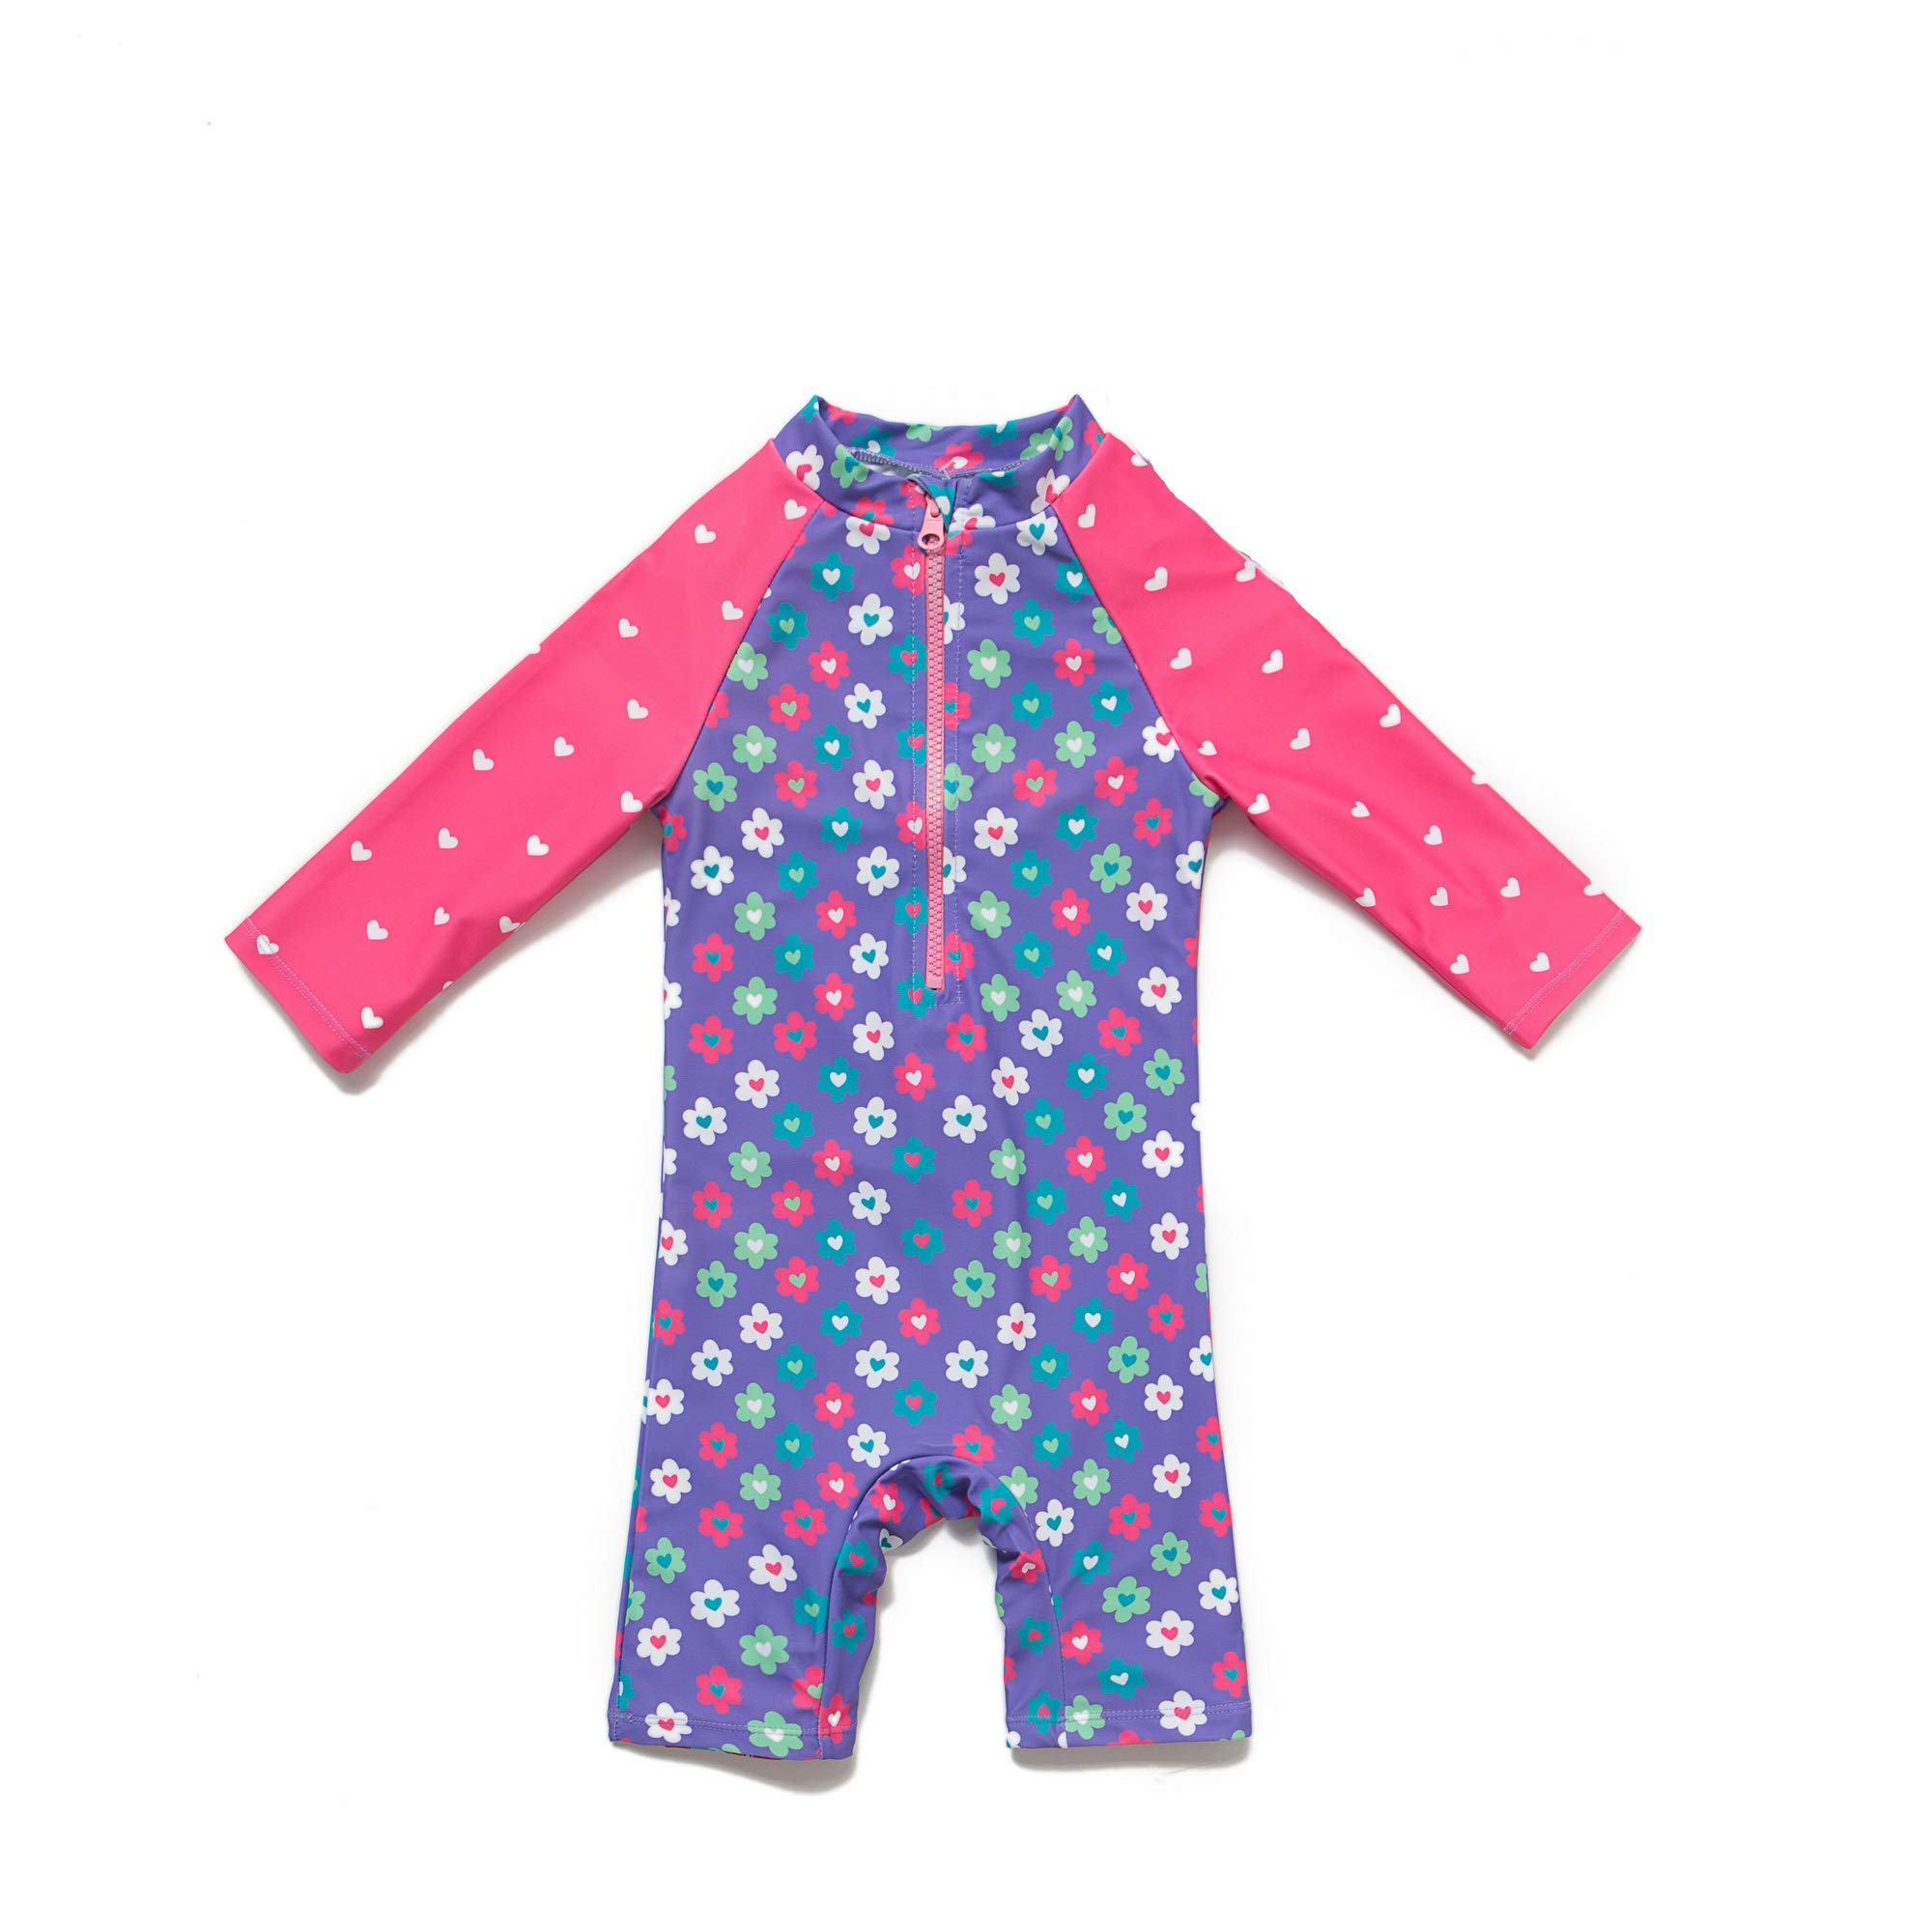 Baby Kids Boys Girls One Pieces Cartoon Print Long Sleeve Rash Guard UPF 50 UV Swimsuit with Sun Hat